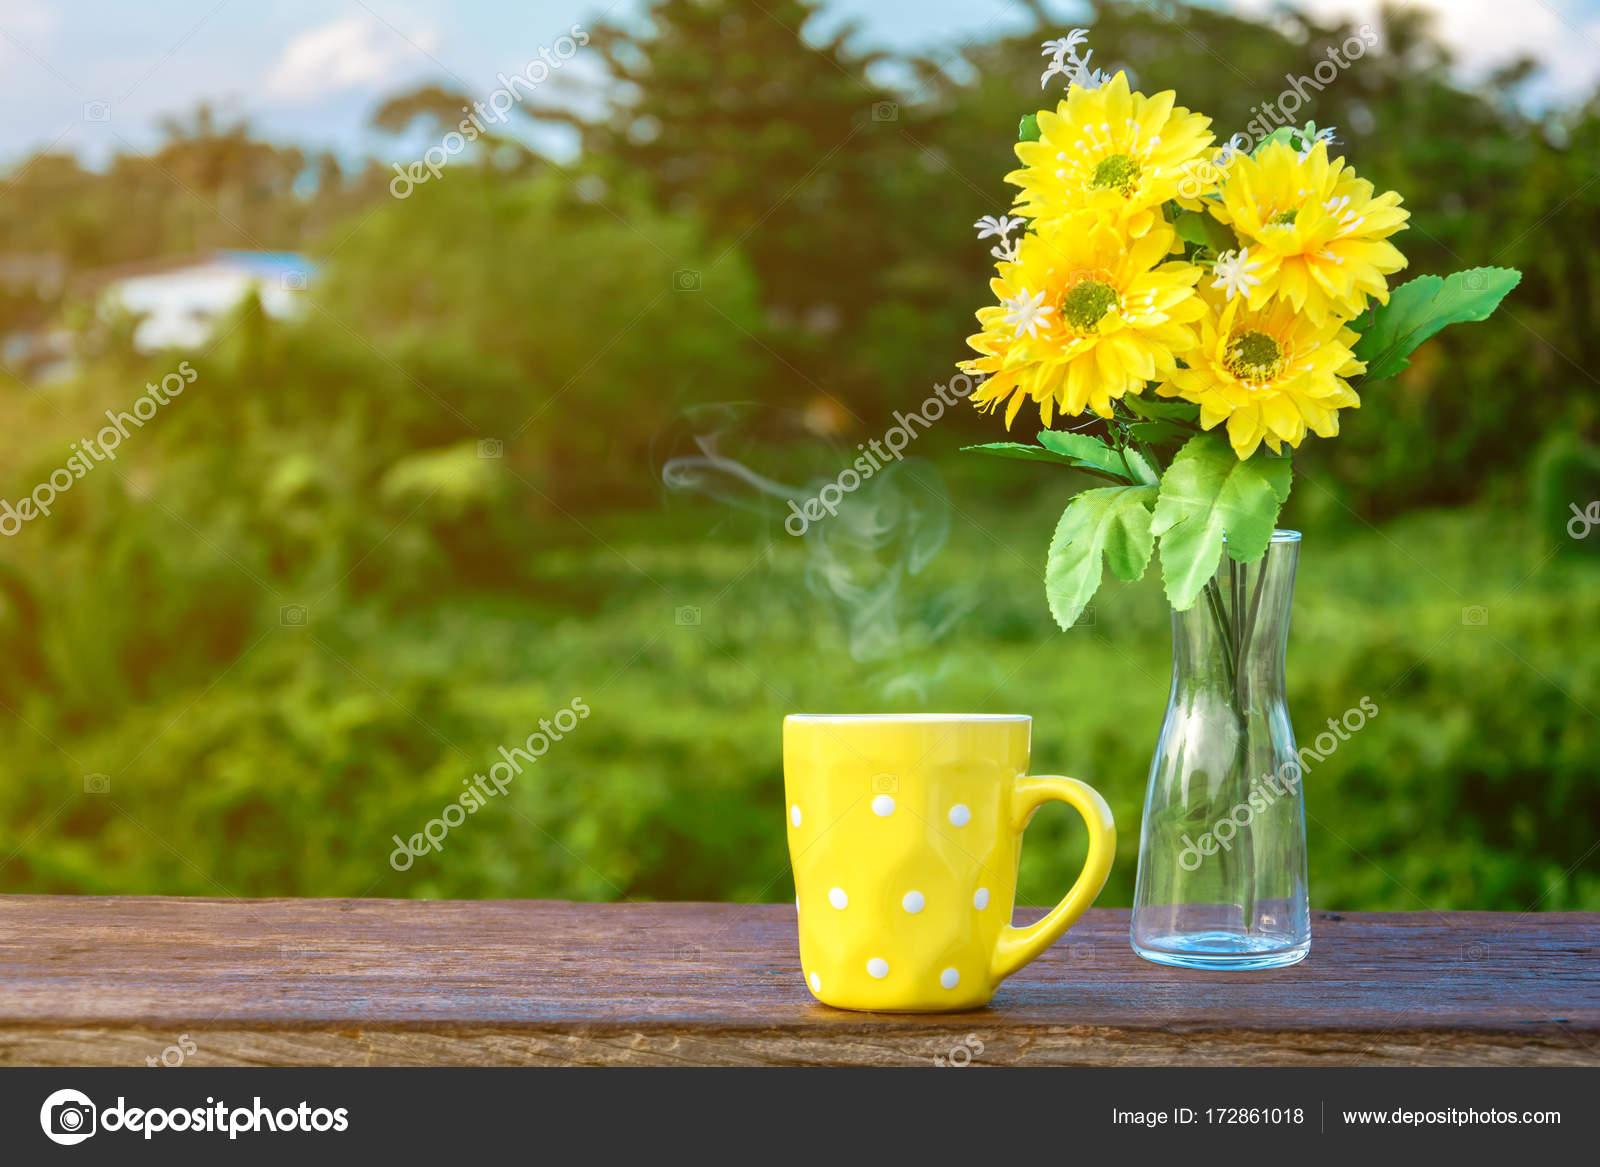 Good morning coffee and yellow flower vase stock photo good morning coffee and yellow flower vase stock photo mightylinksfo